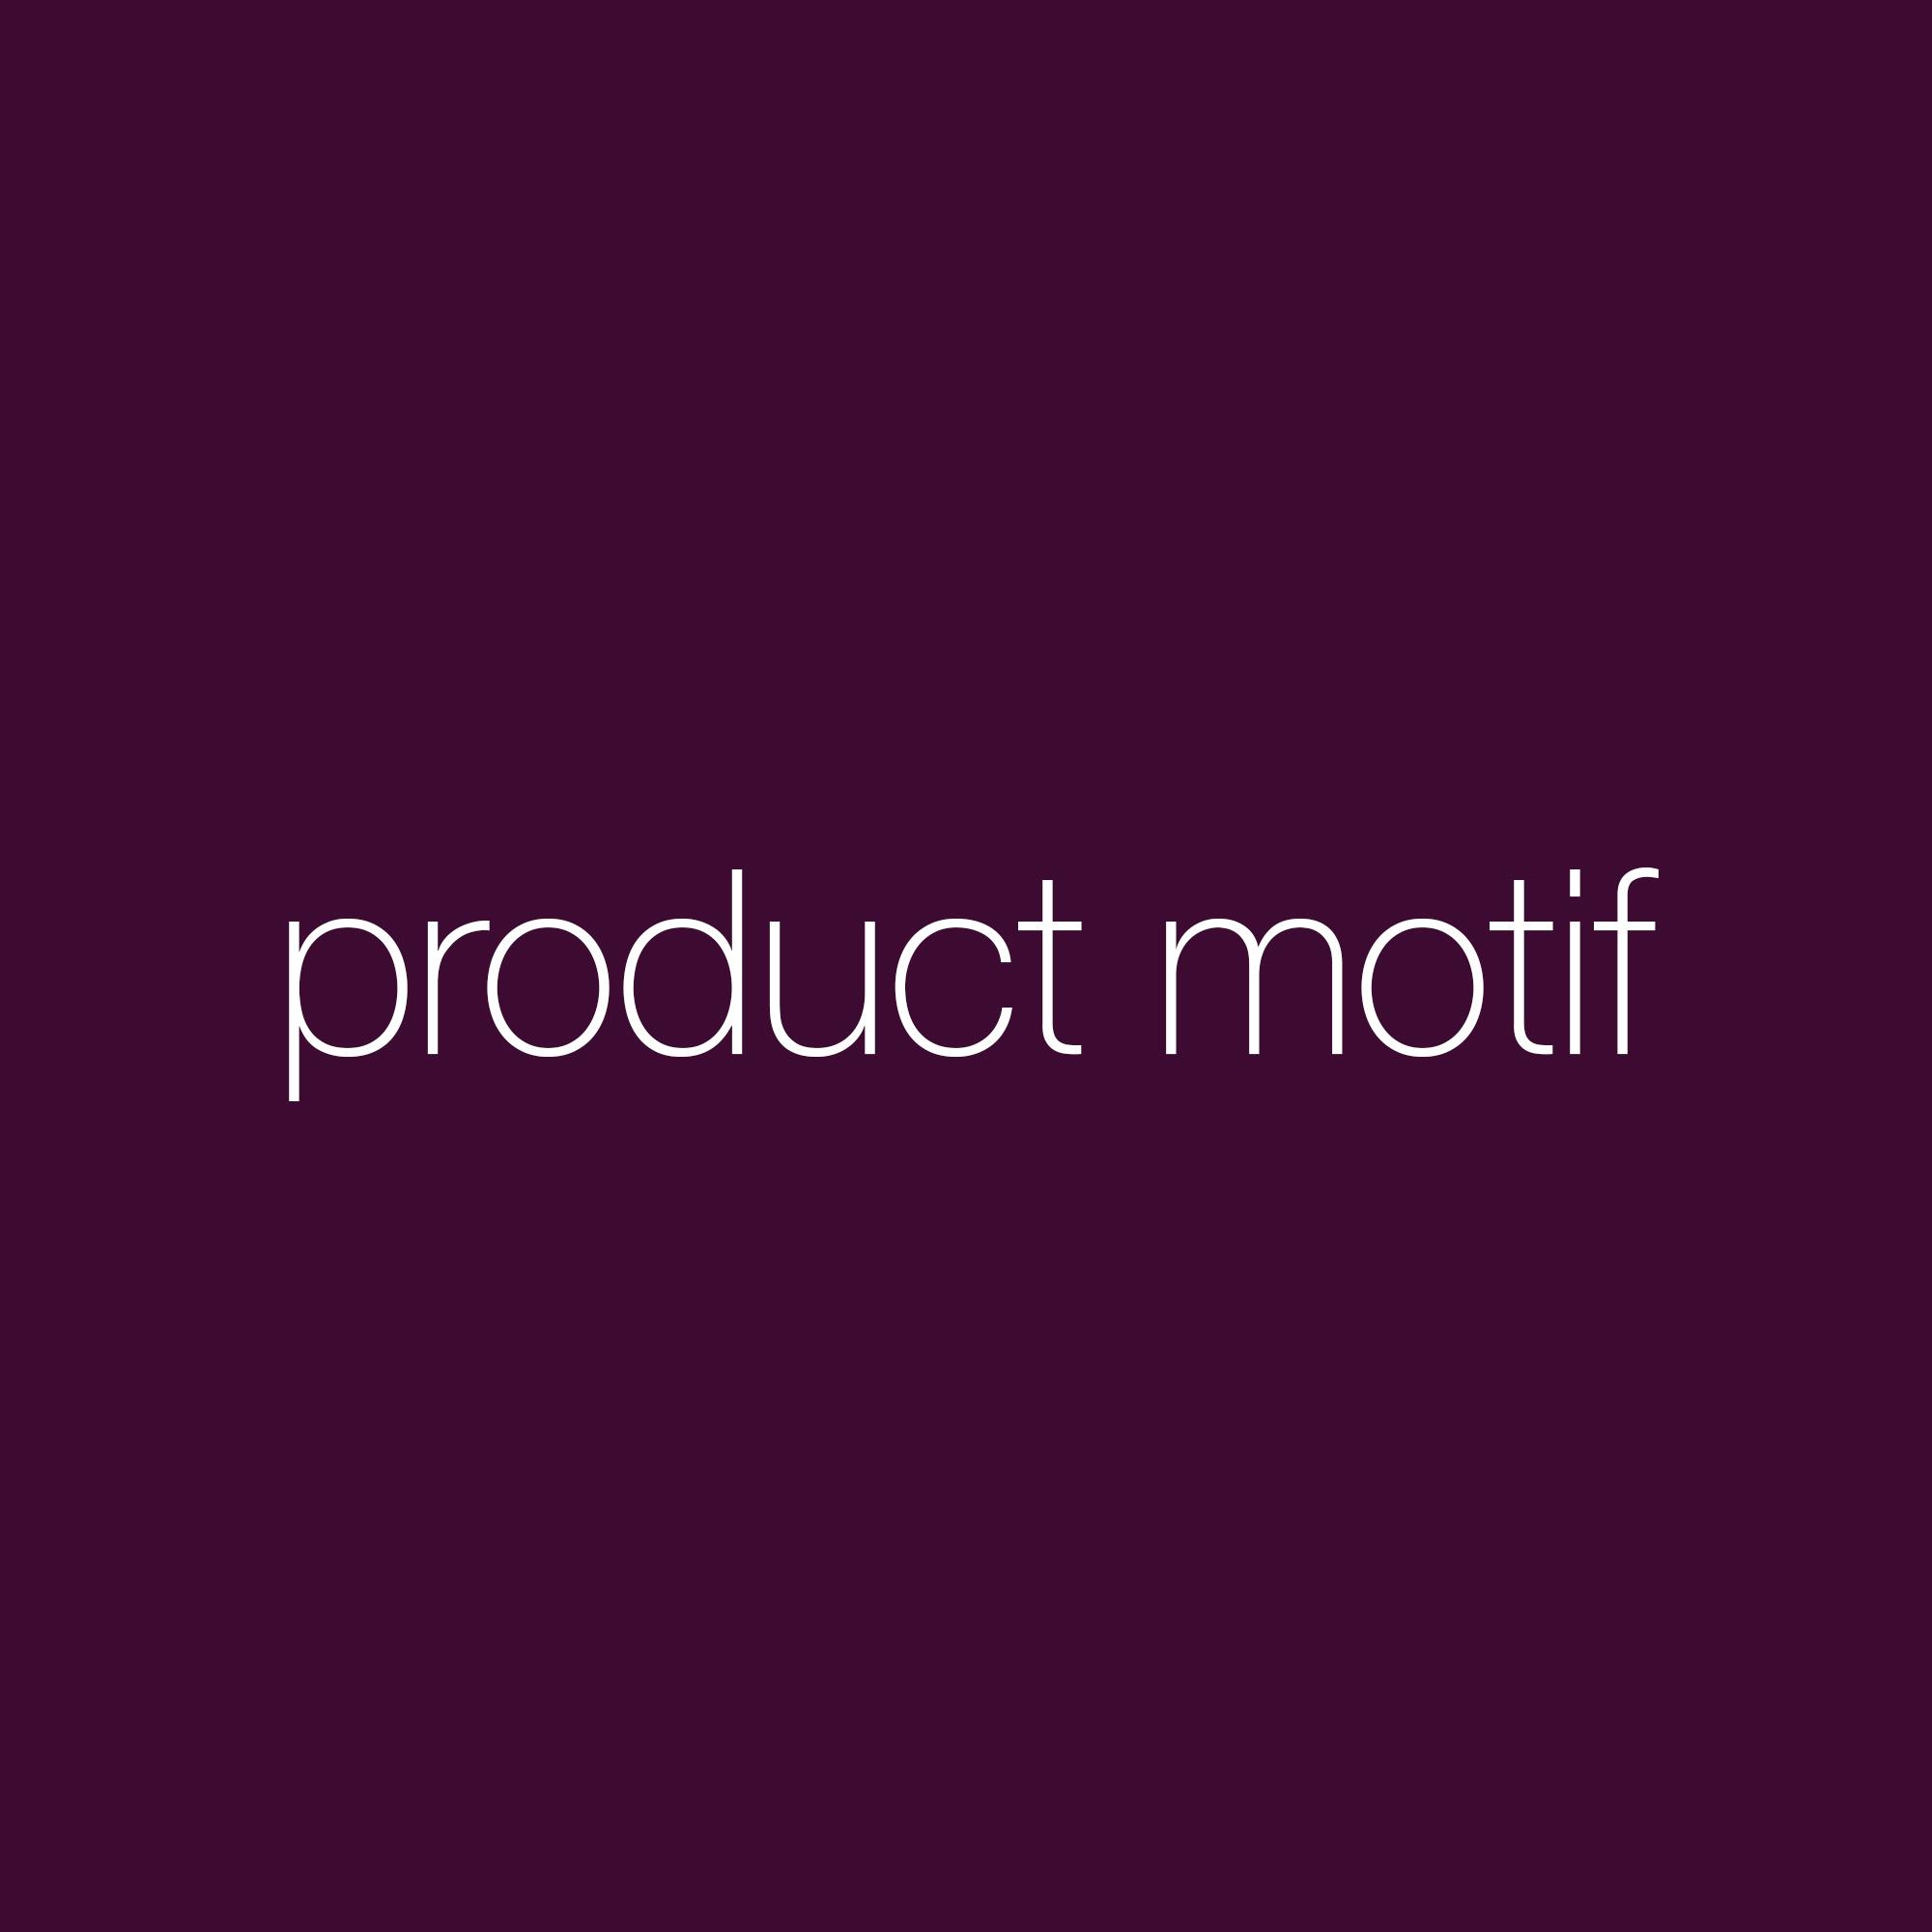 sidebar-icon-attribute-product-motif